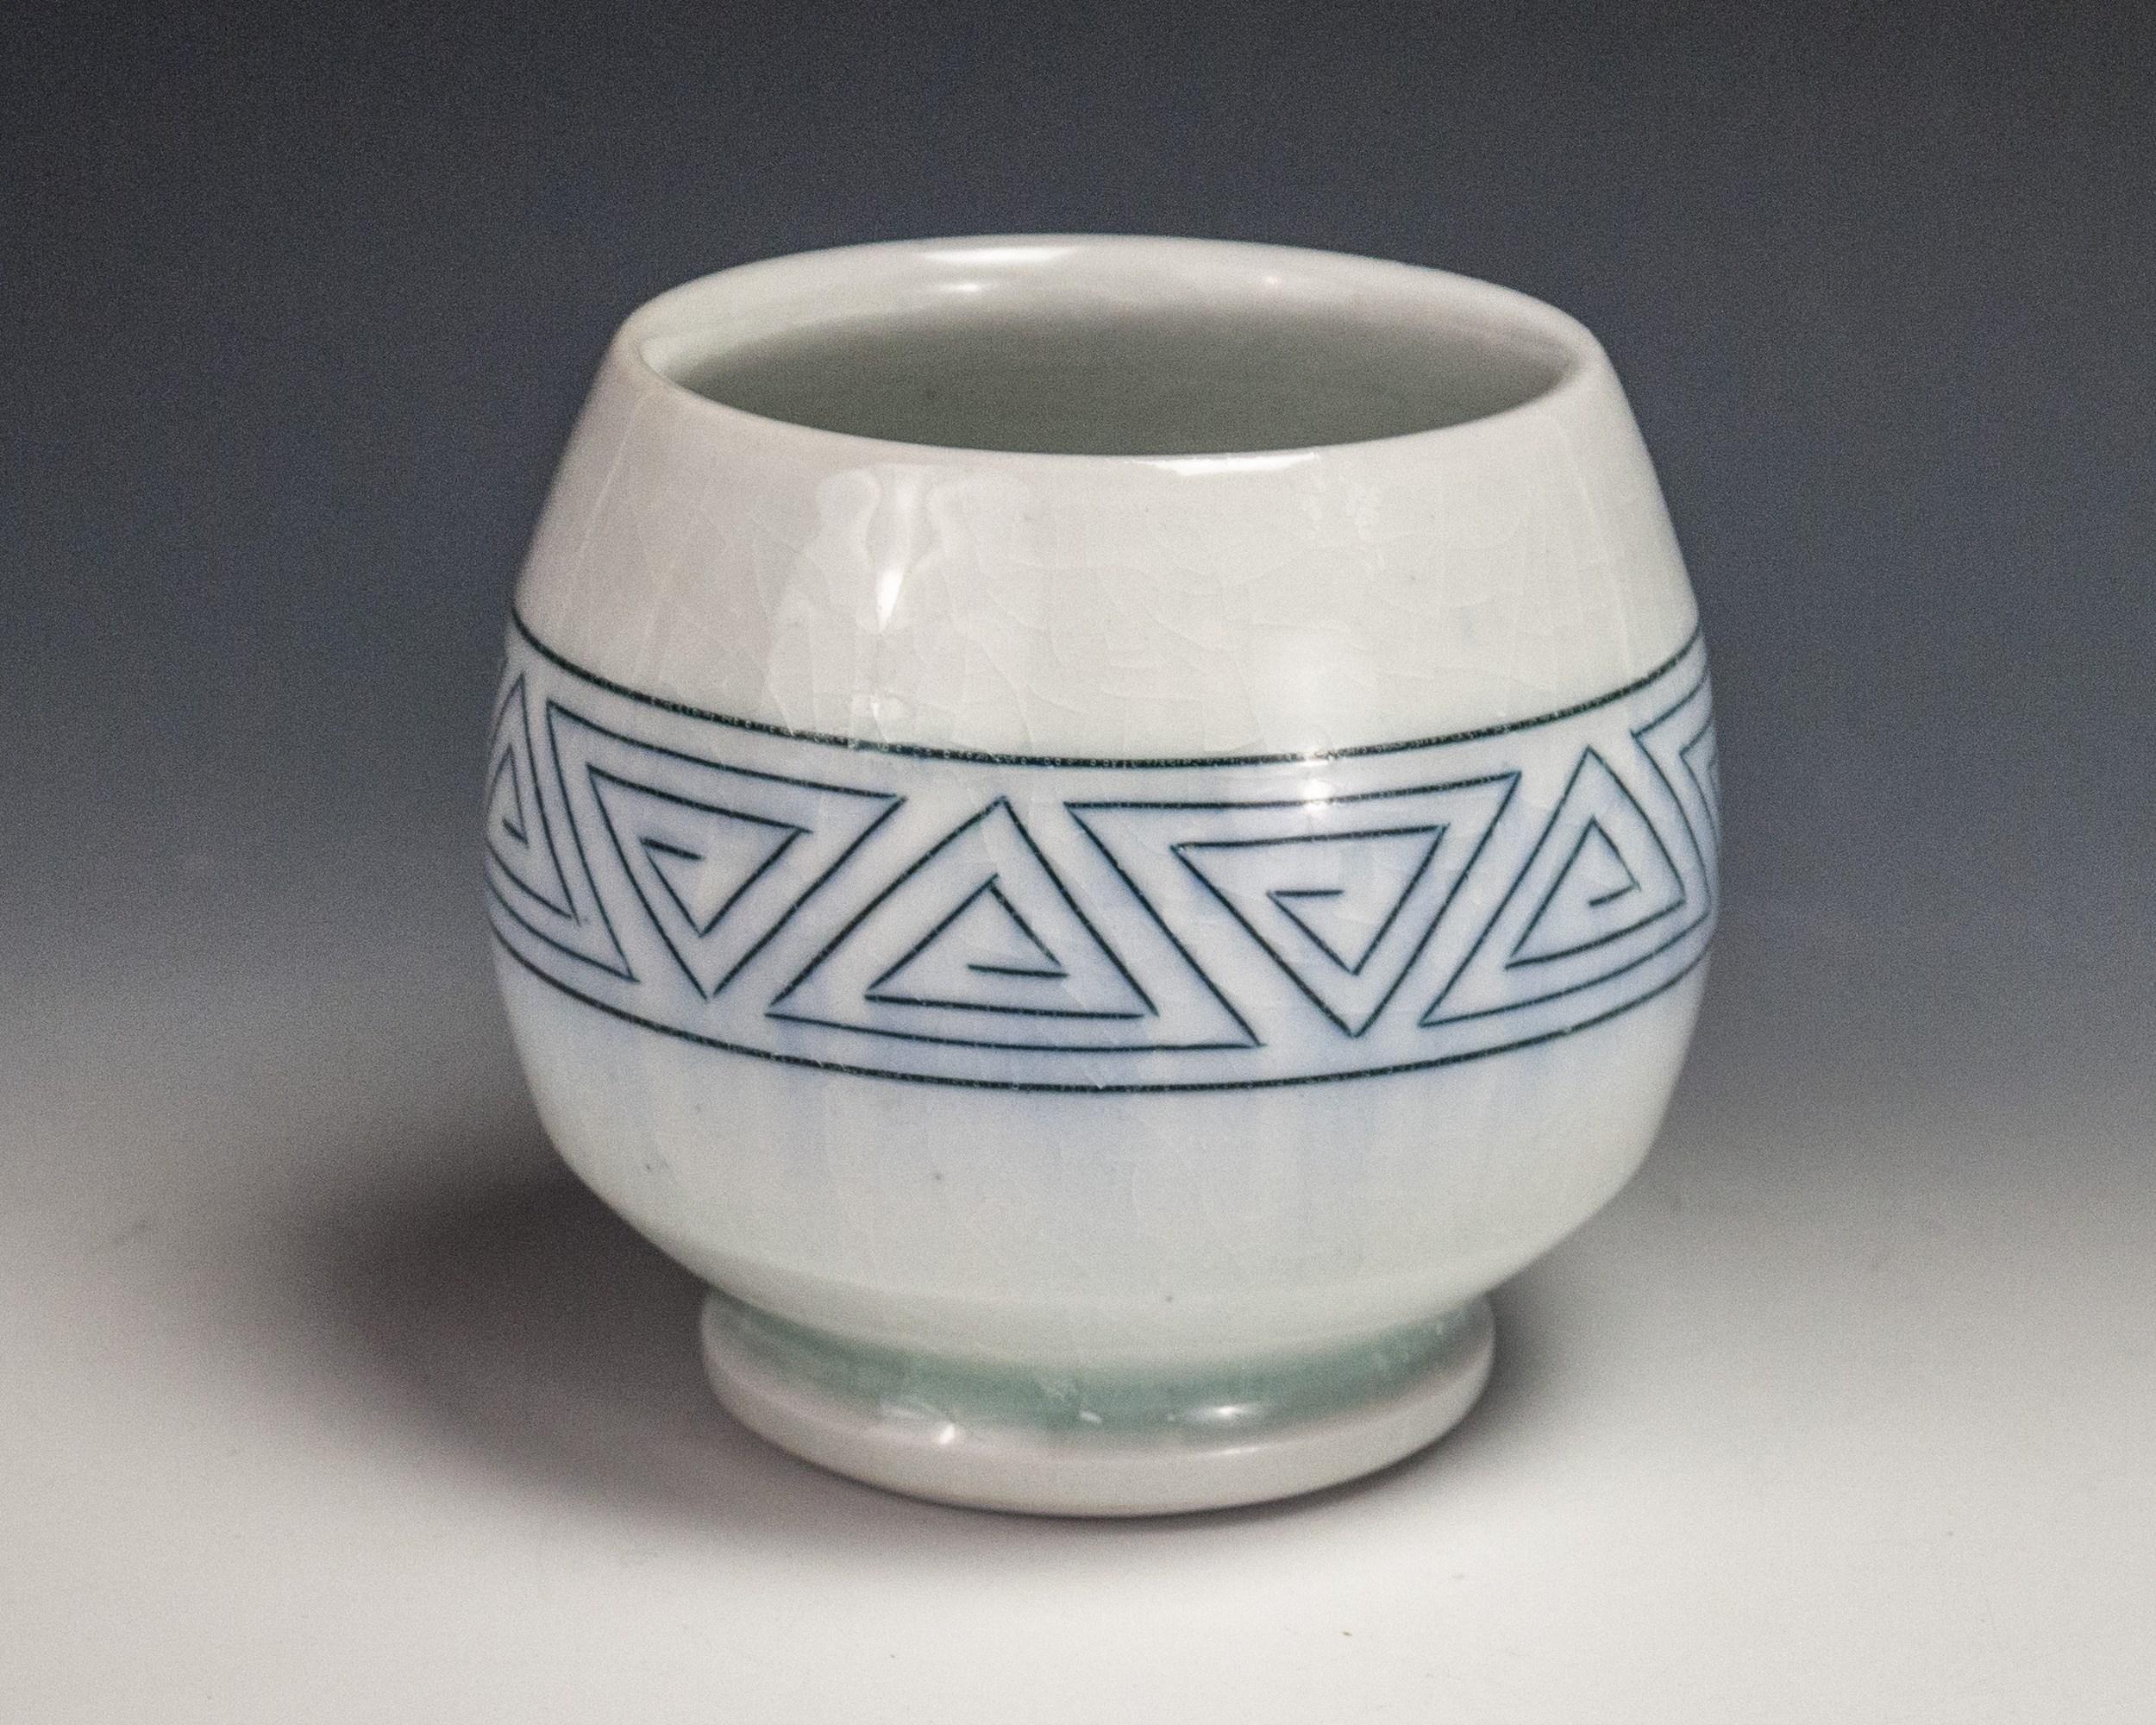 Sgraffito Triangle Cup